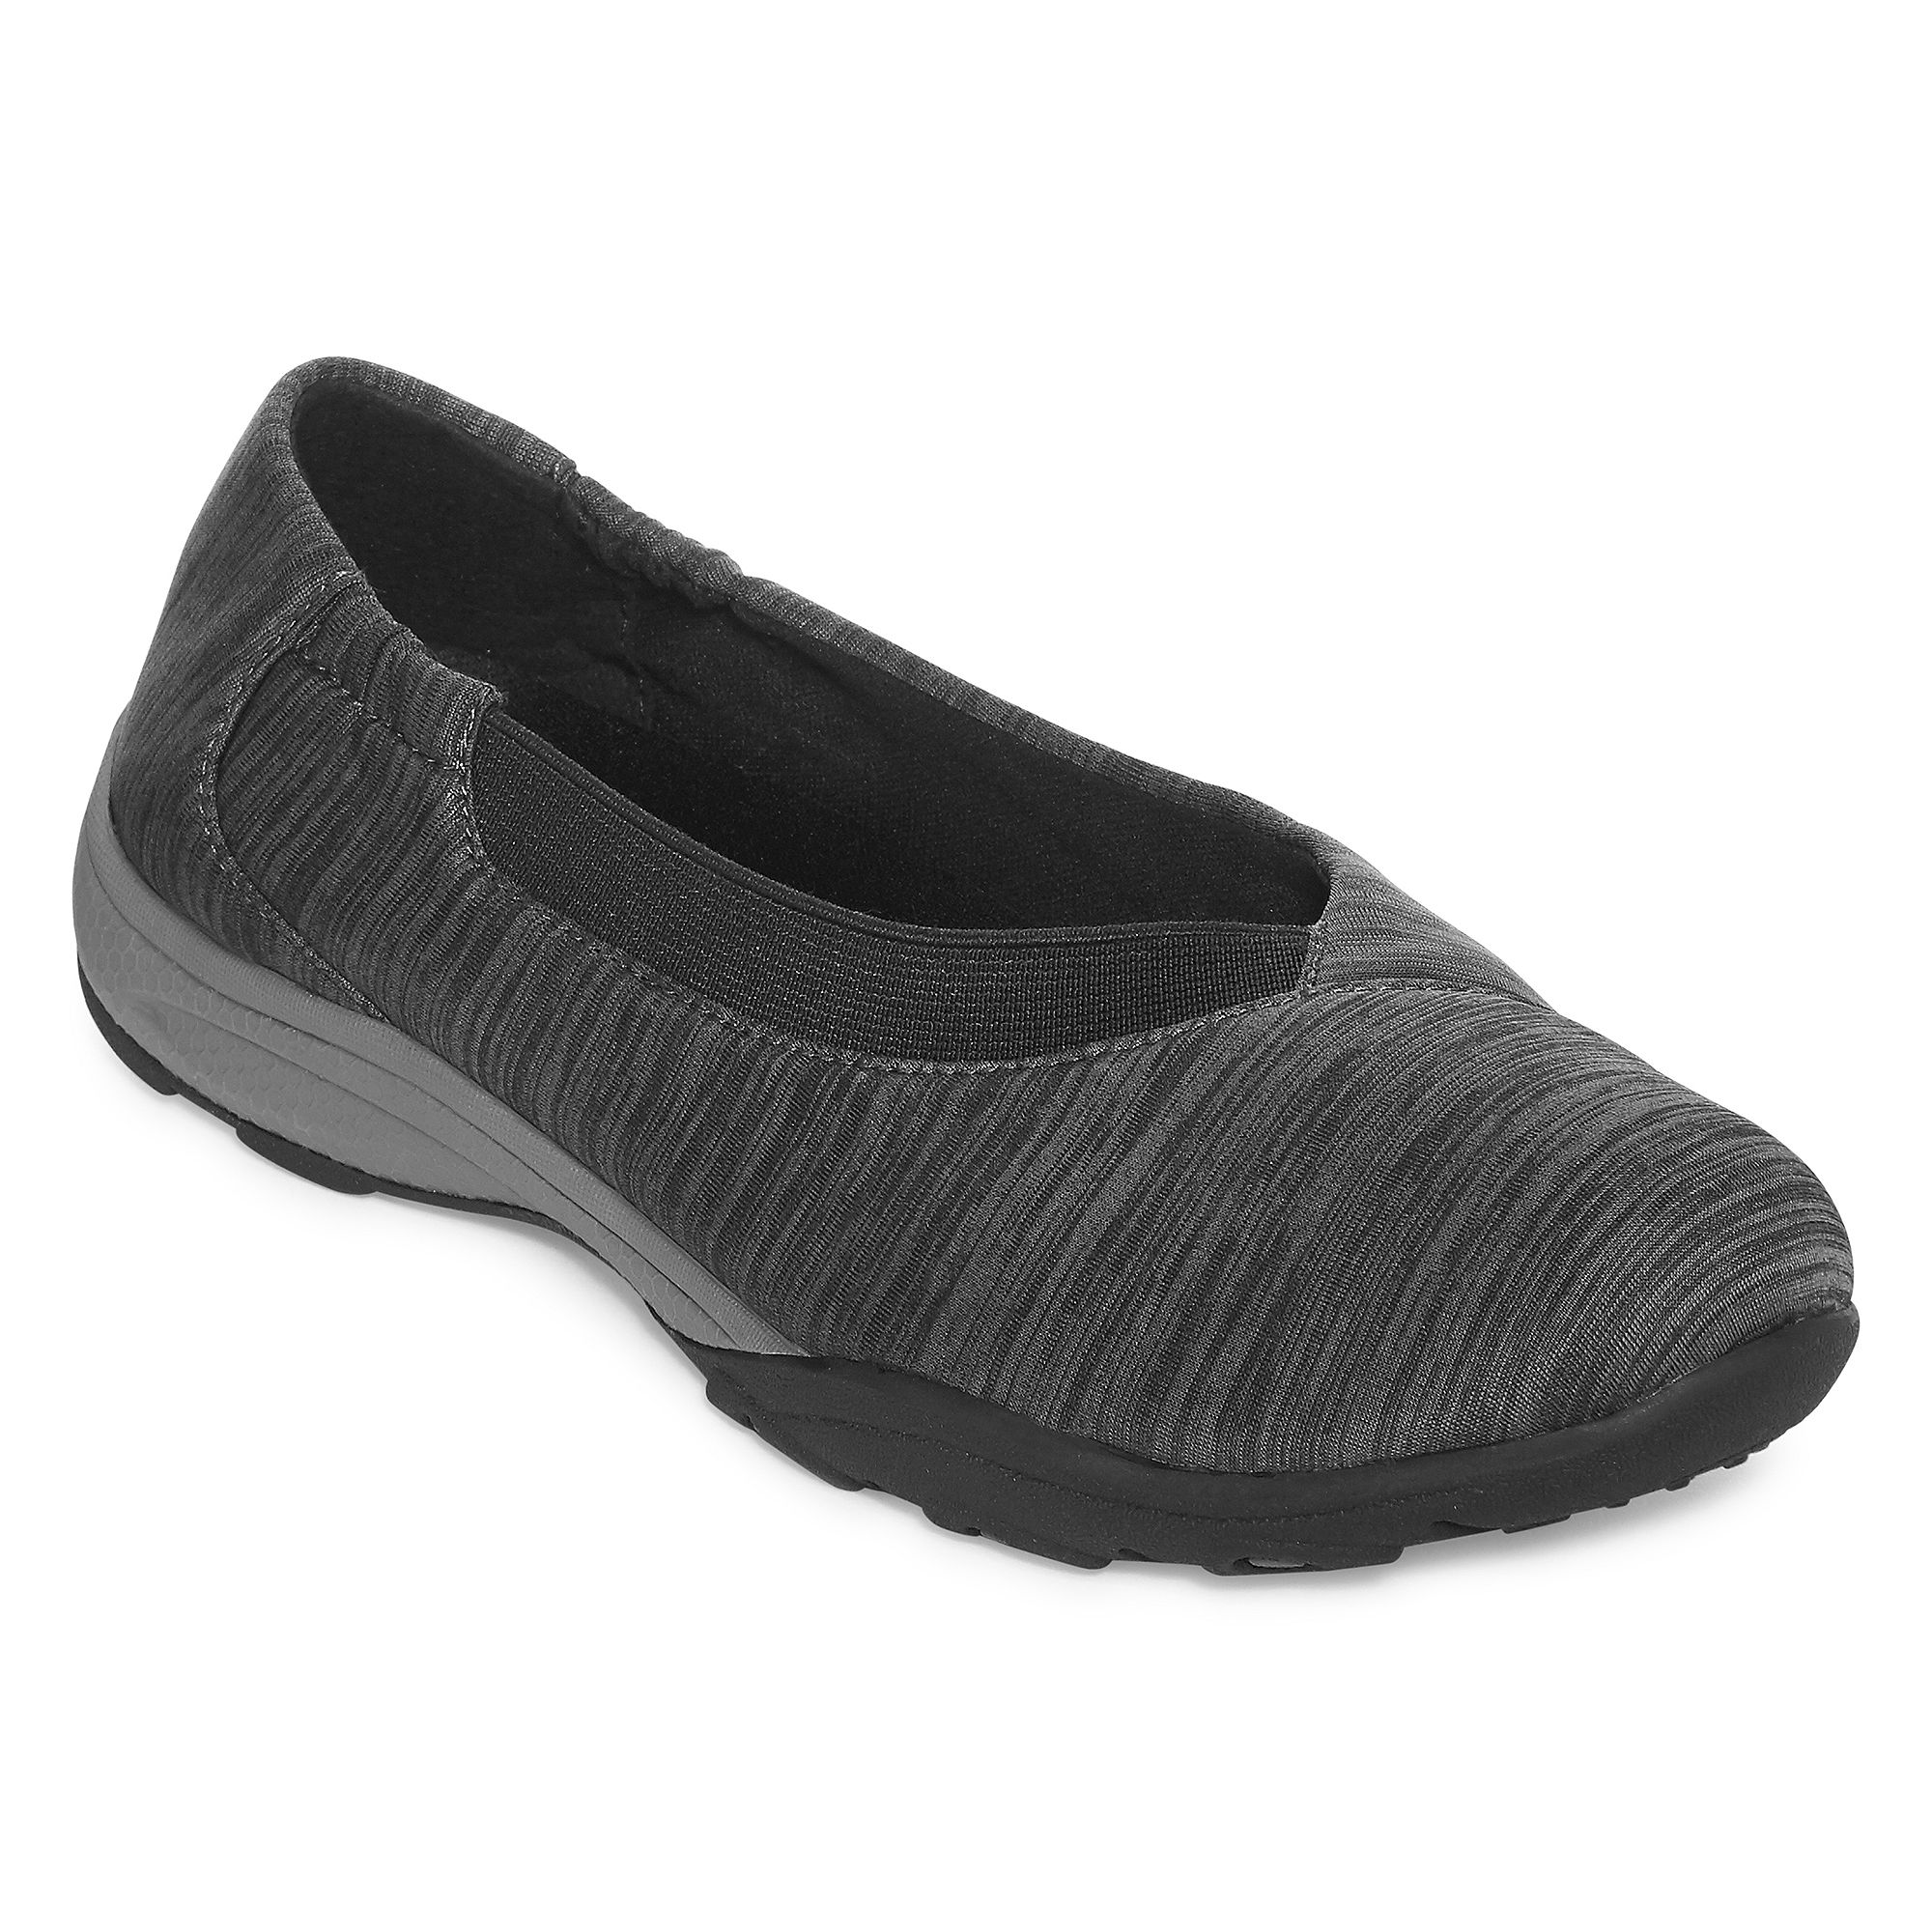 b1564533fb5f UPC 718987499808 product image for Zibu™ Zibu Hiley Slip On Shoe